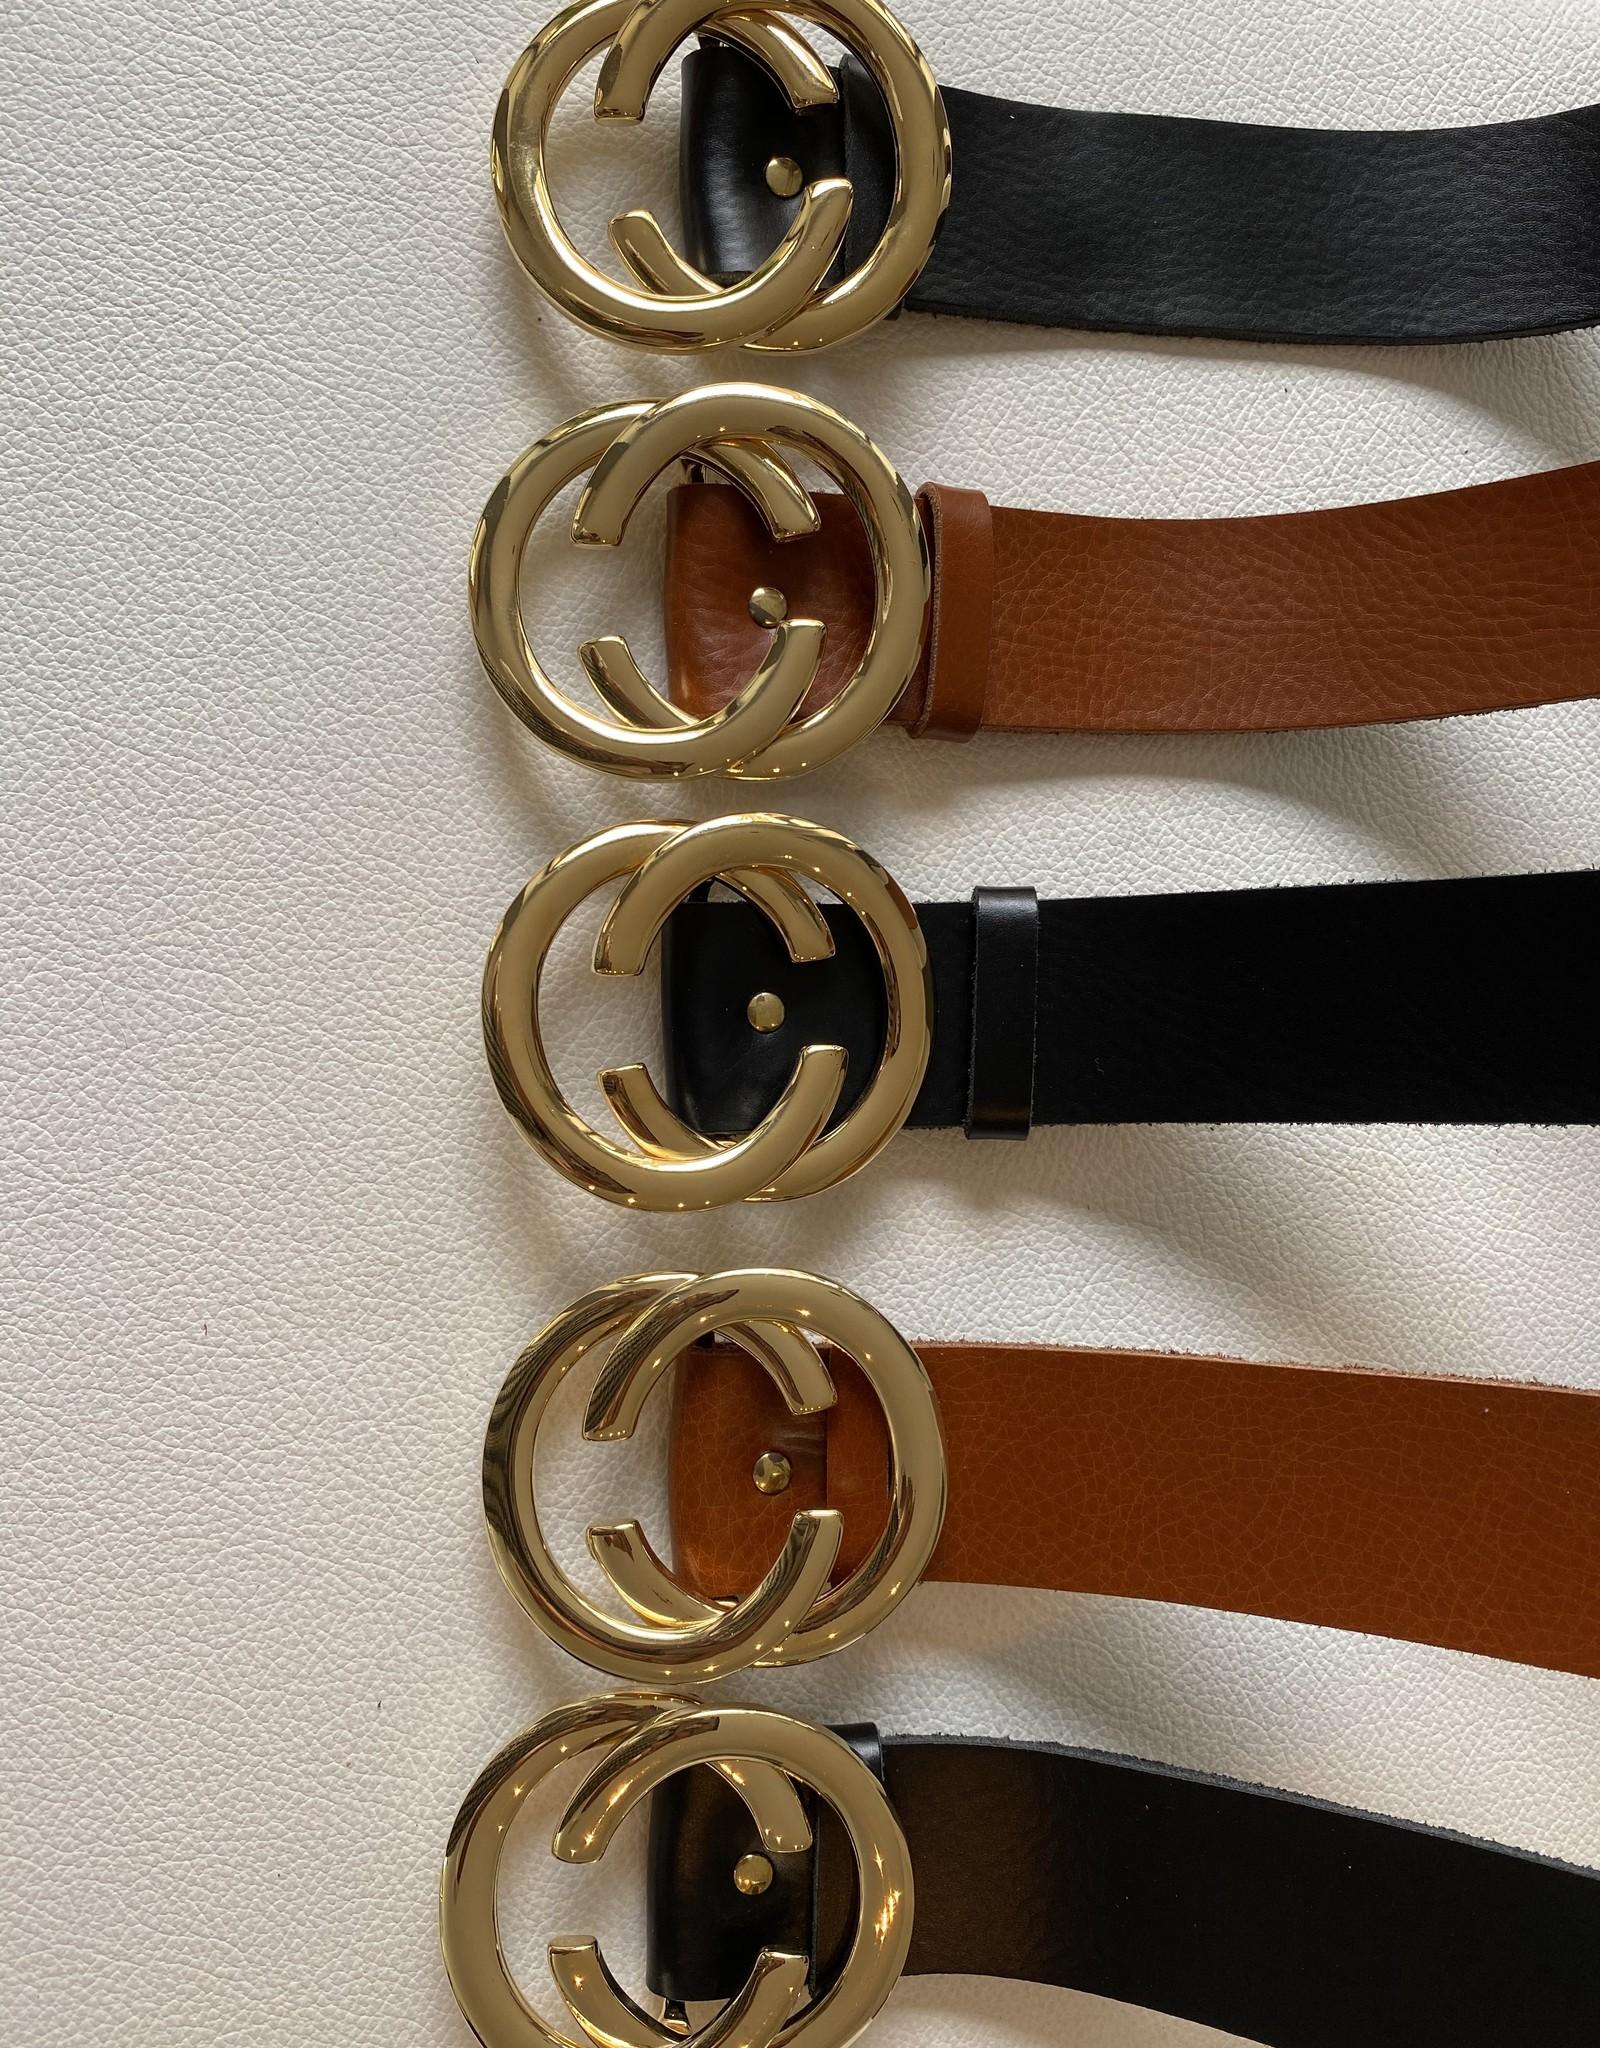 Lederen riem met goudkleurige gesp met detail